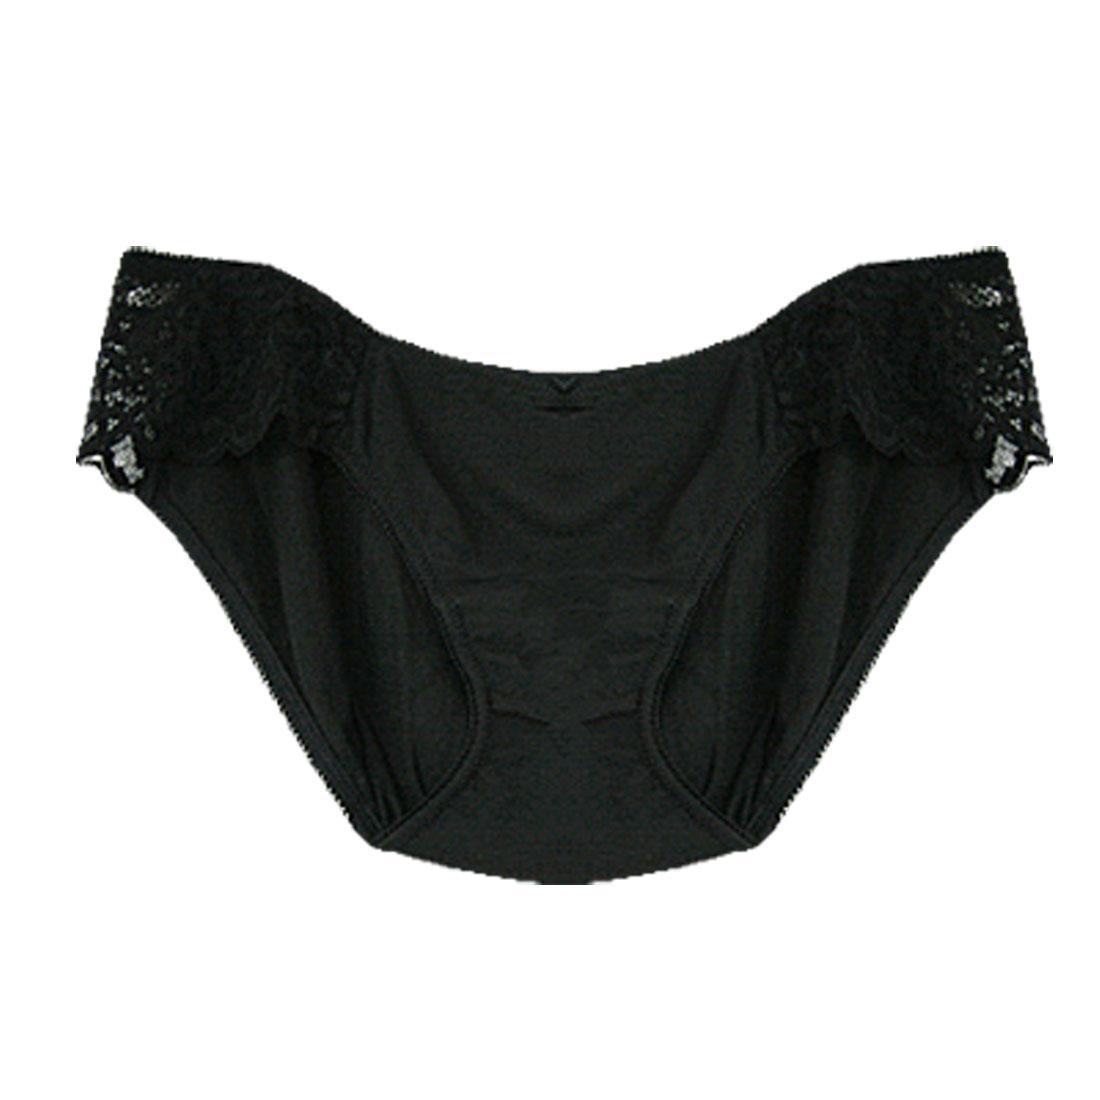 Ladies Black High Cut Panties Size S Underwear Briefs